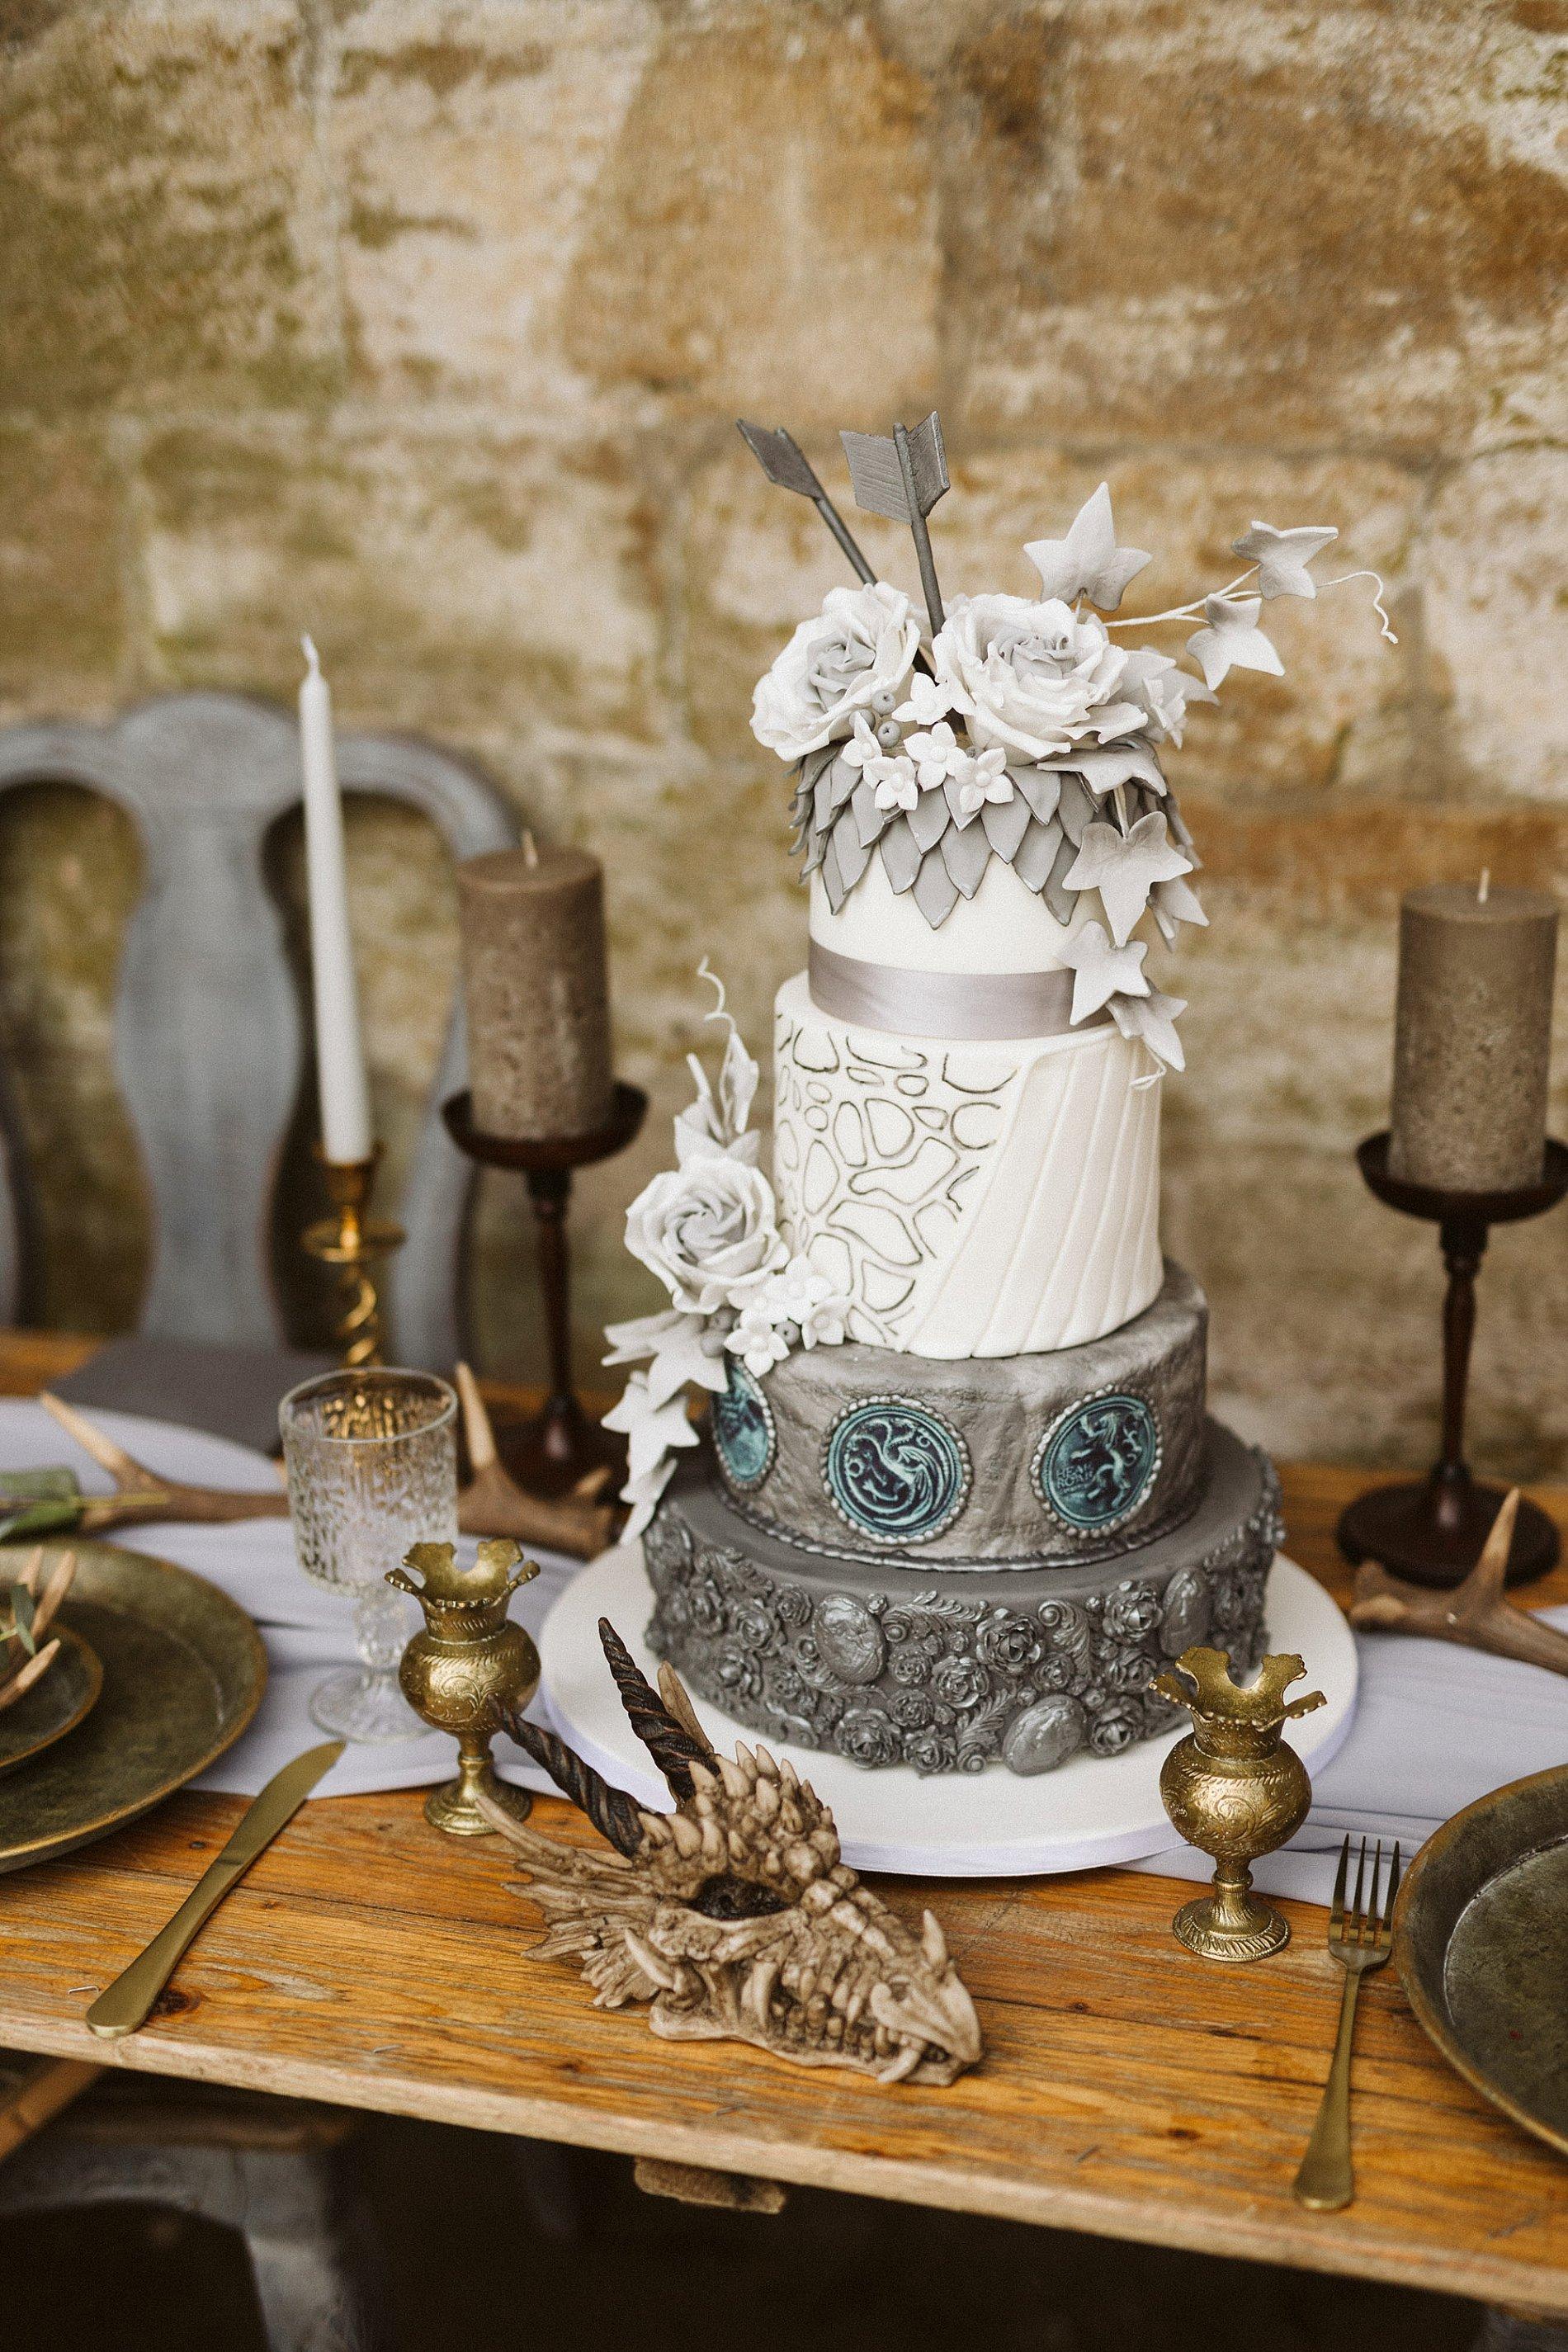 Game of Thrones Creative Bridal Shoot (c) Freya Raby (8)